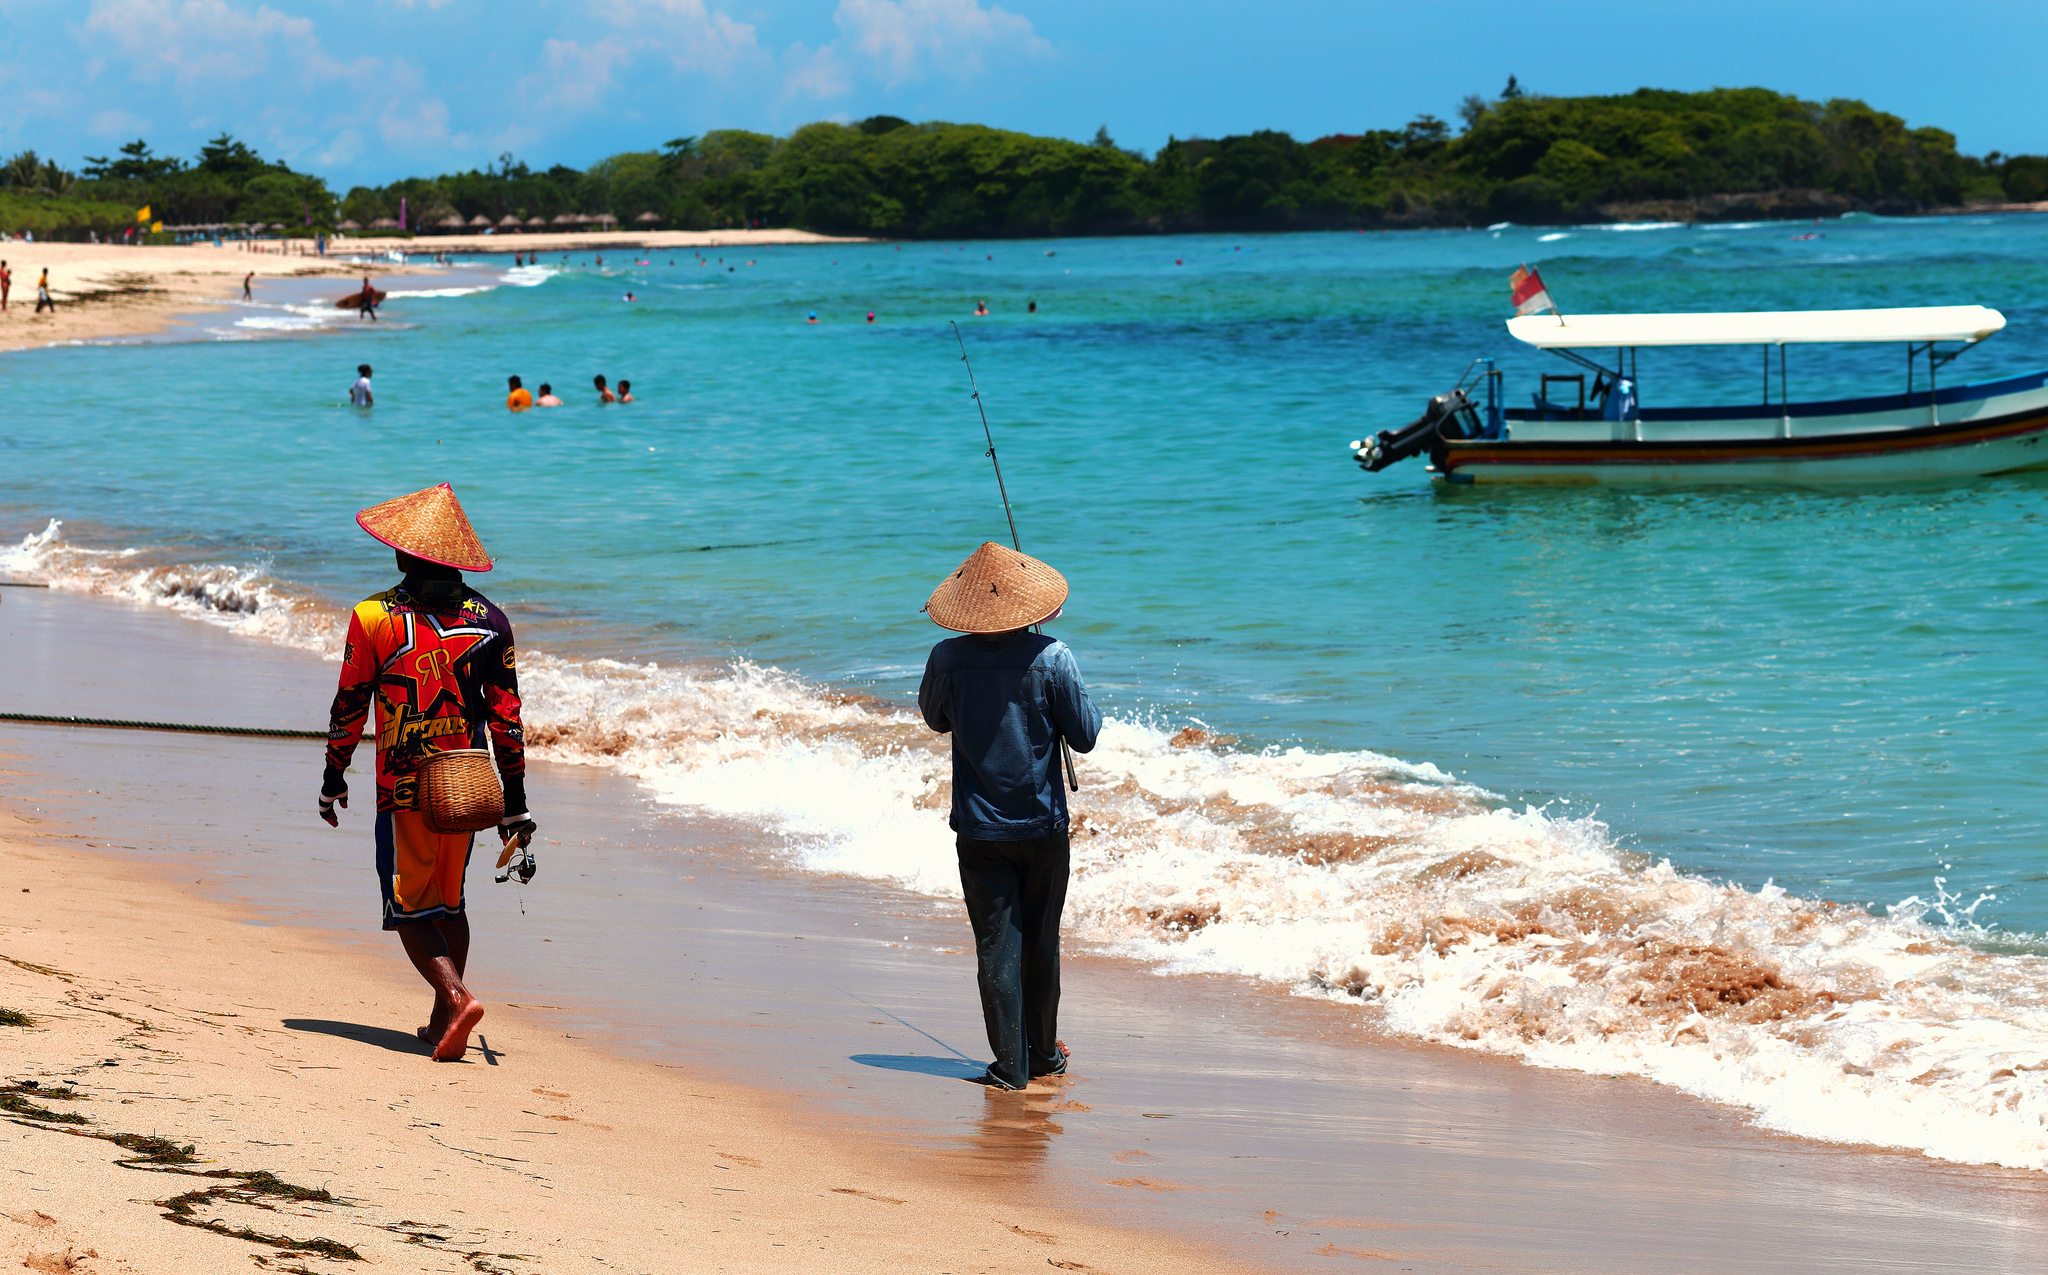 Pláž Nusa Dua,  Thomas Depenbusch